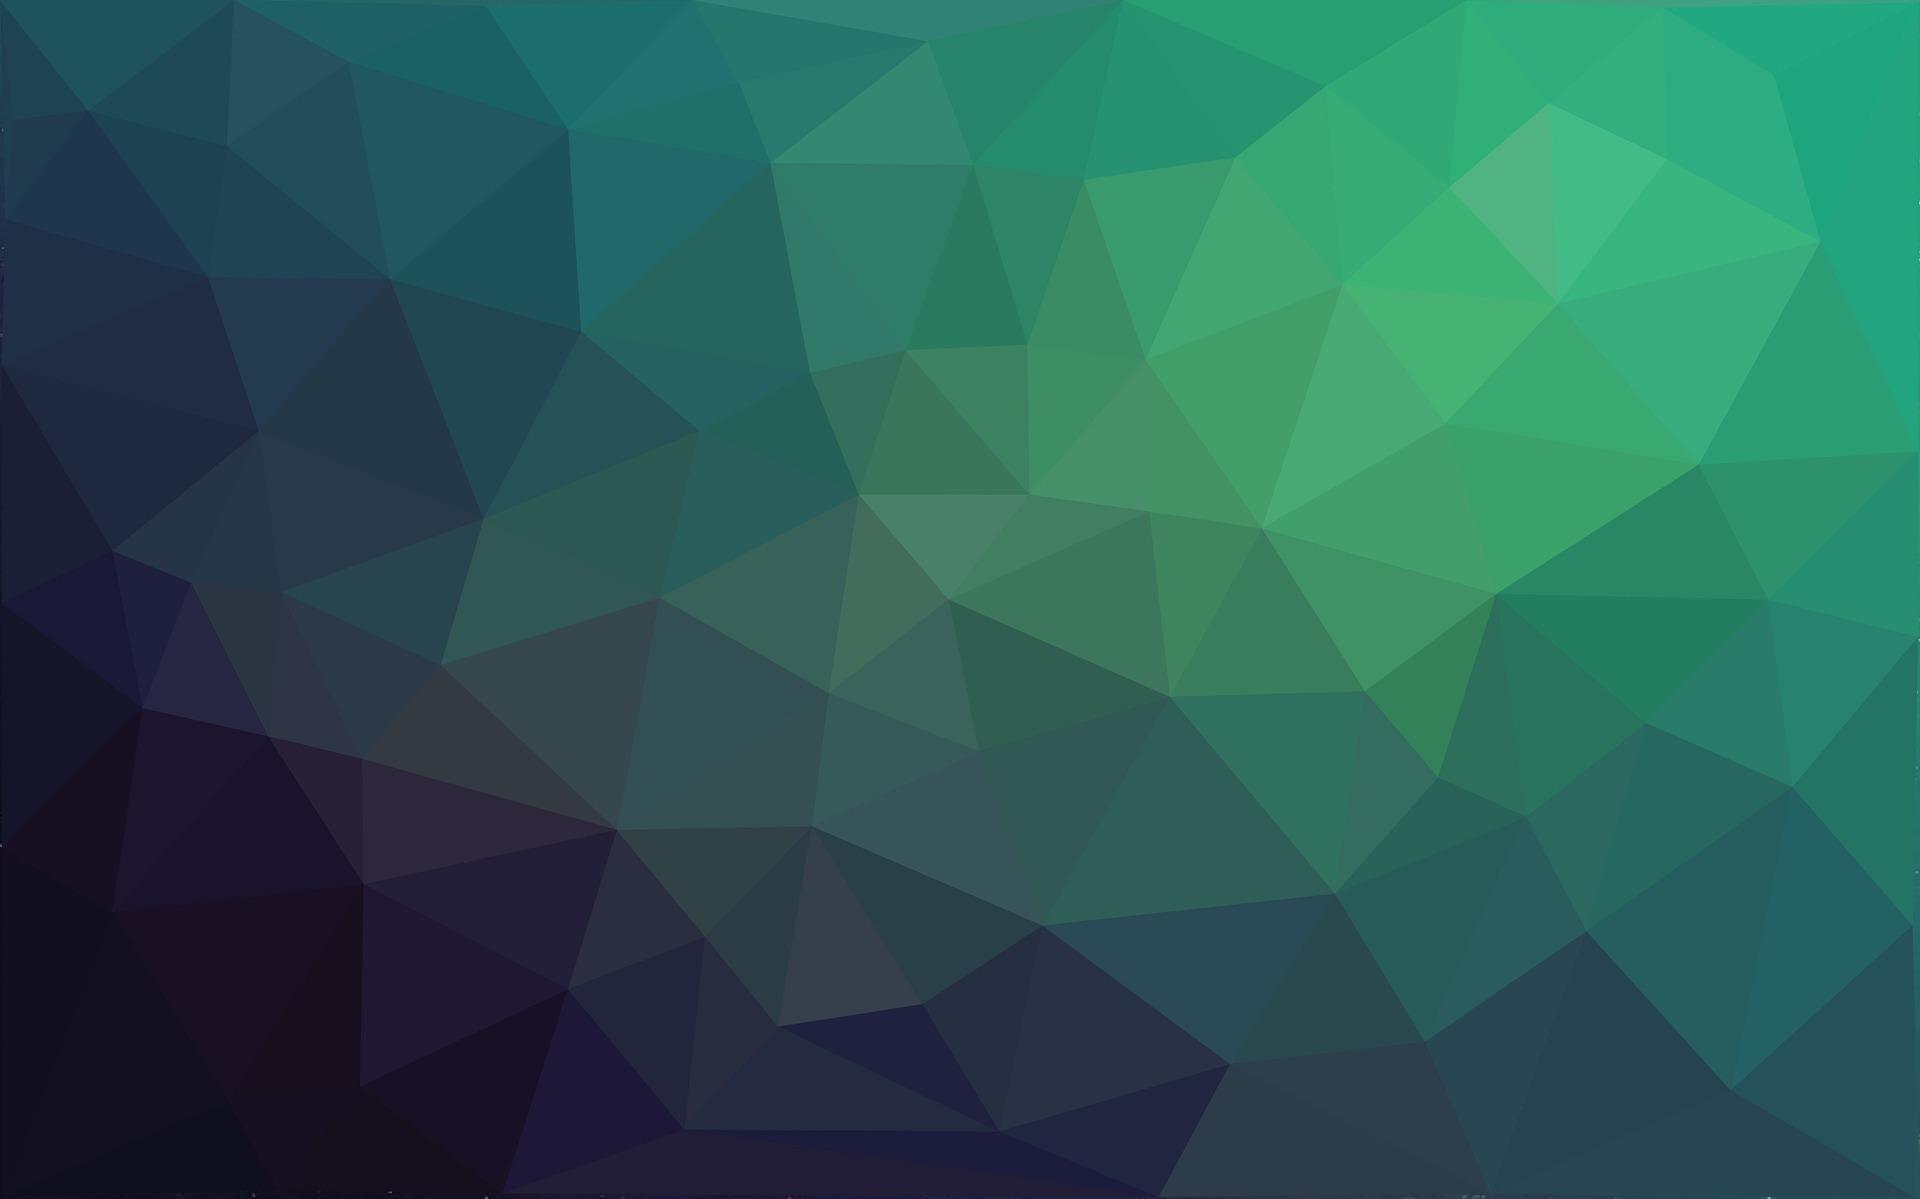 Green triangle mesh